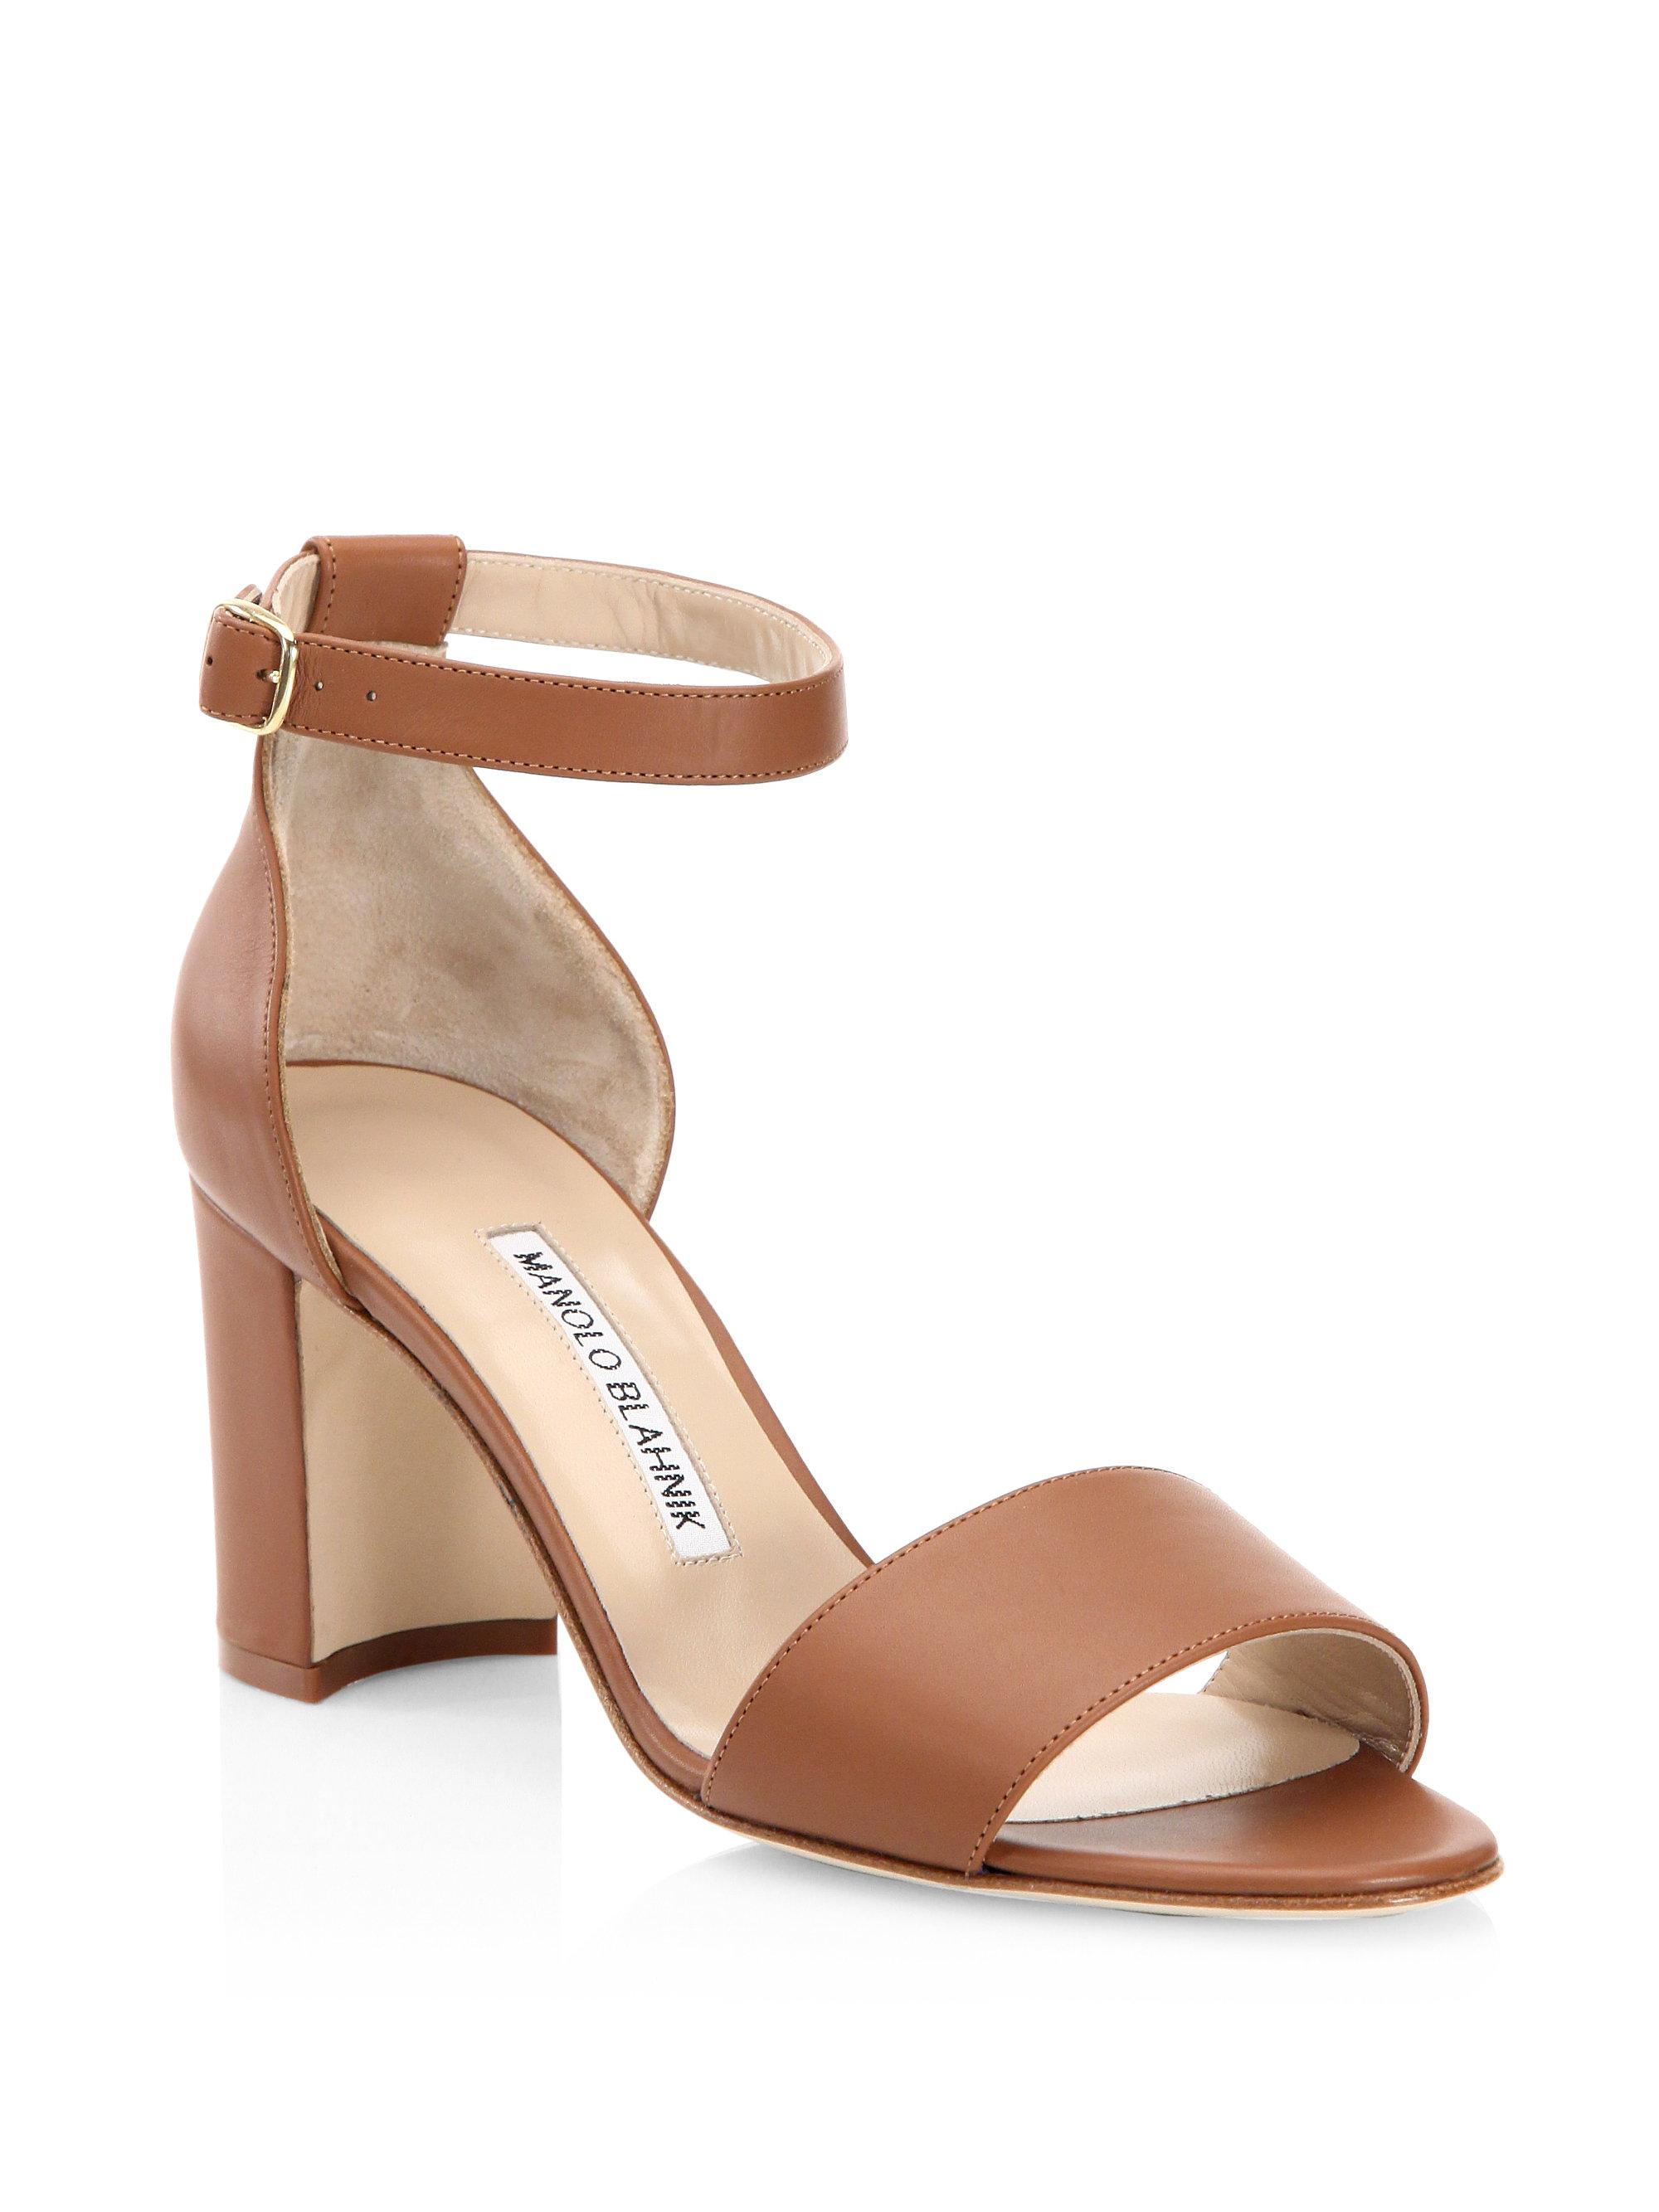 7d1beeefa3d9 Manolo Blahnik Lauratomod Leather Sandals in Brown - Lyst